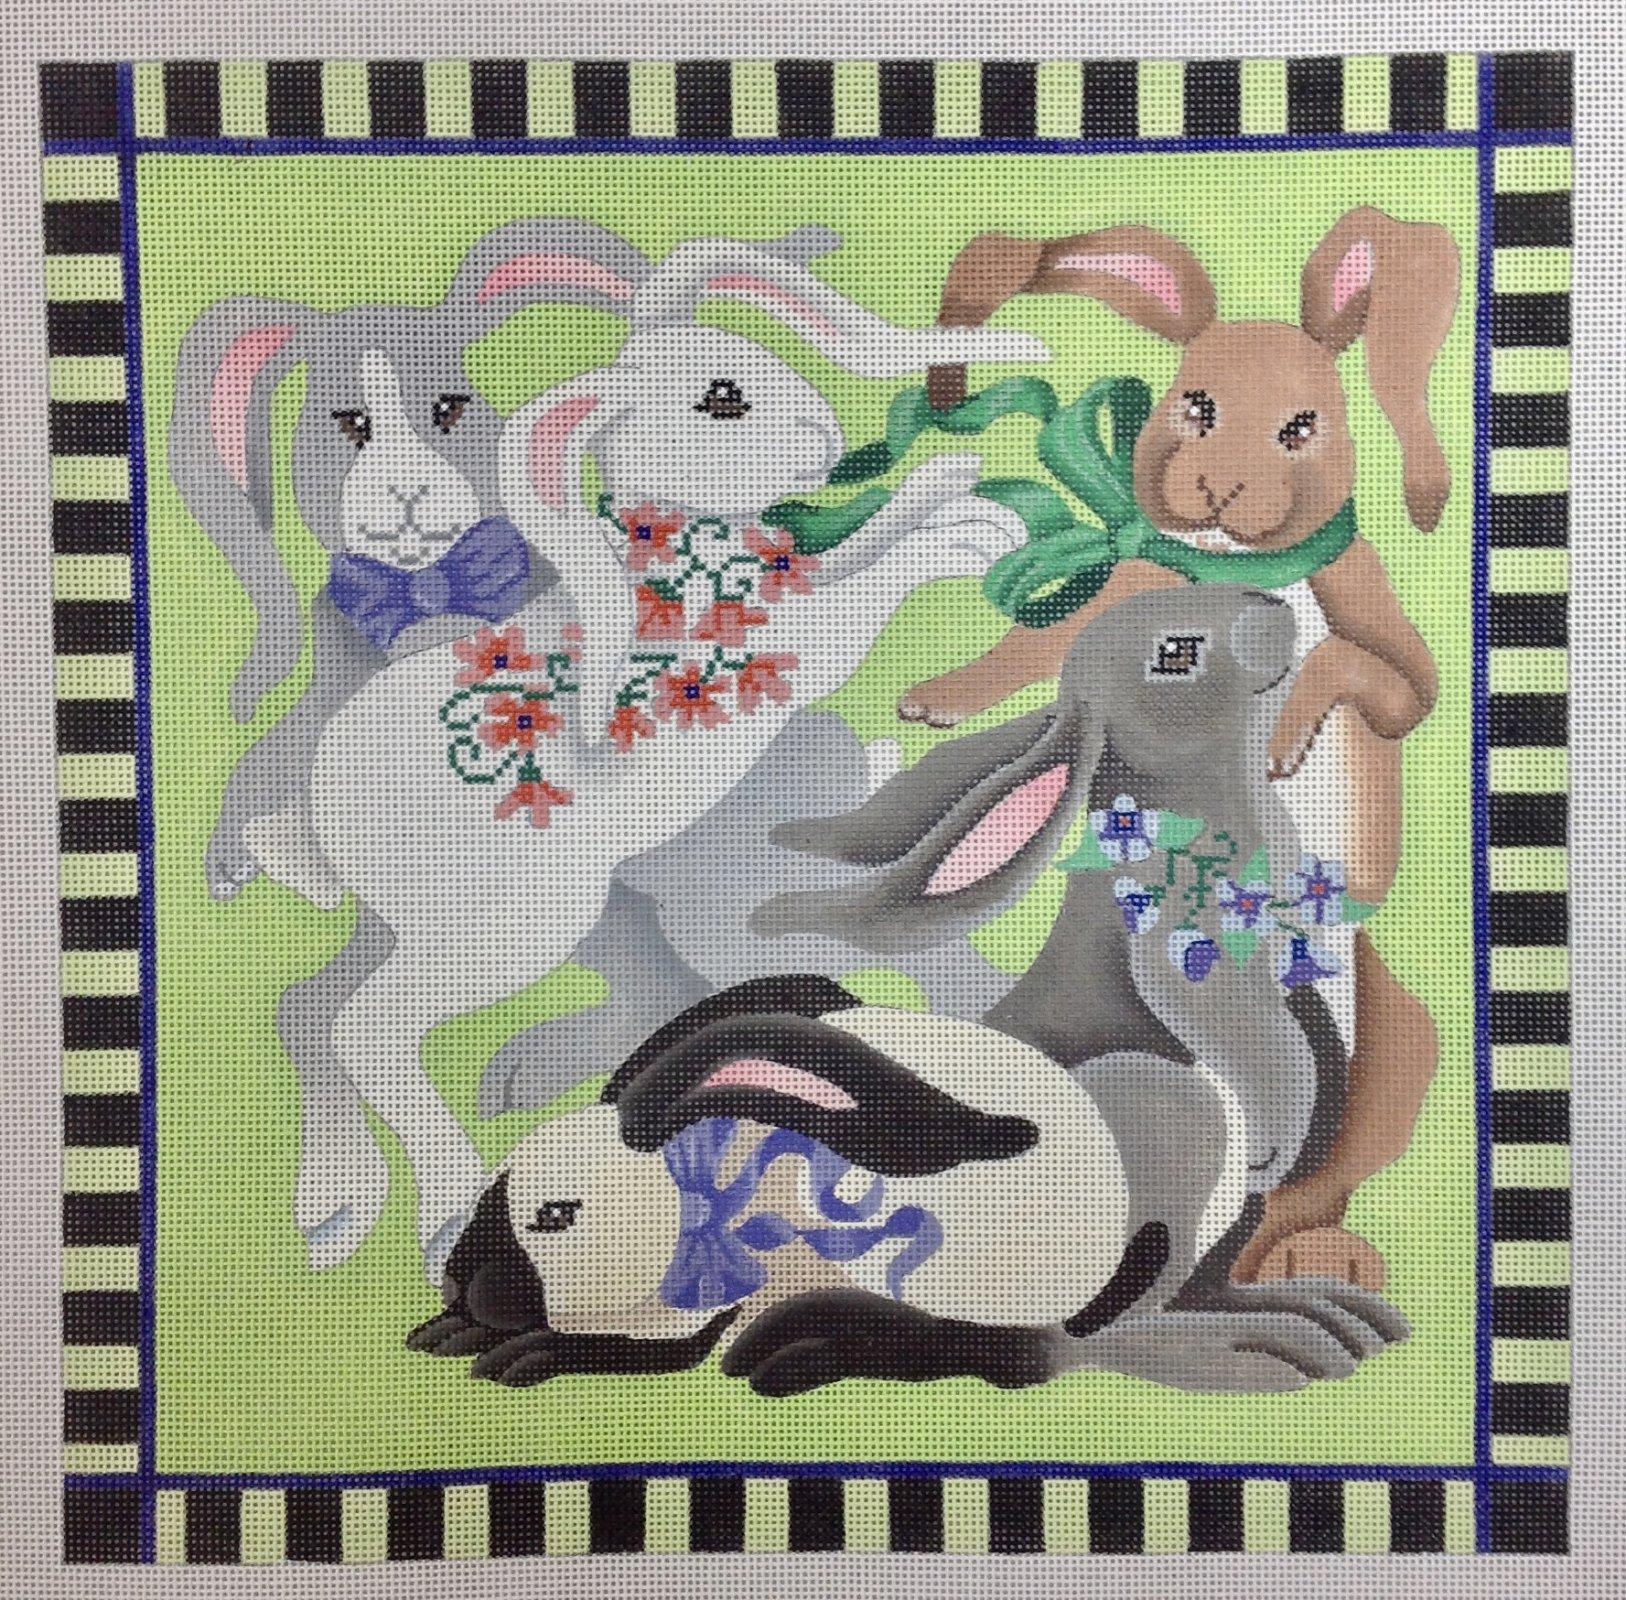 playing bunnies